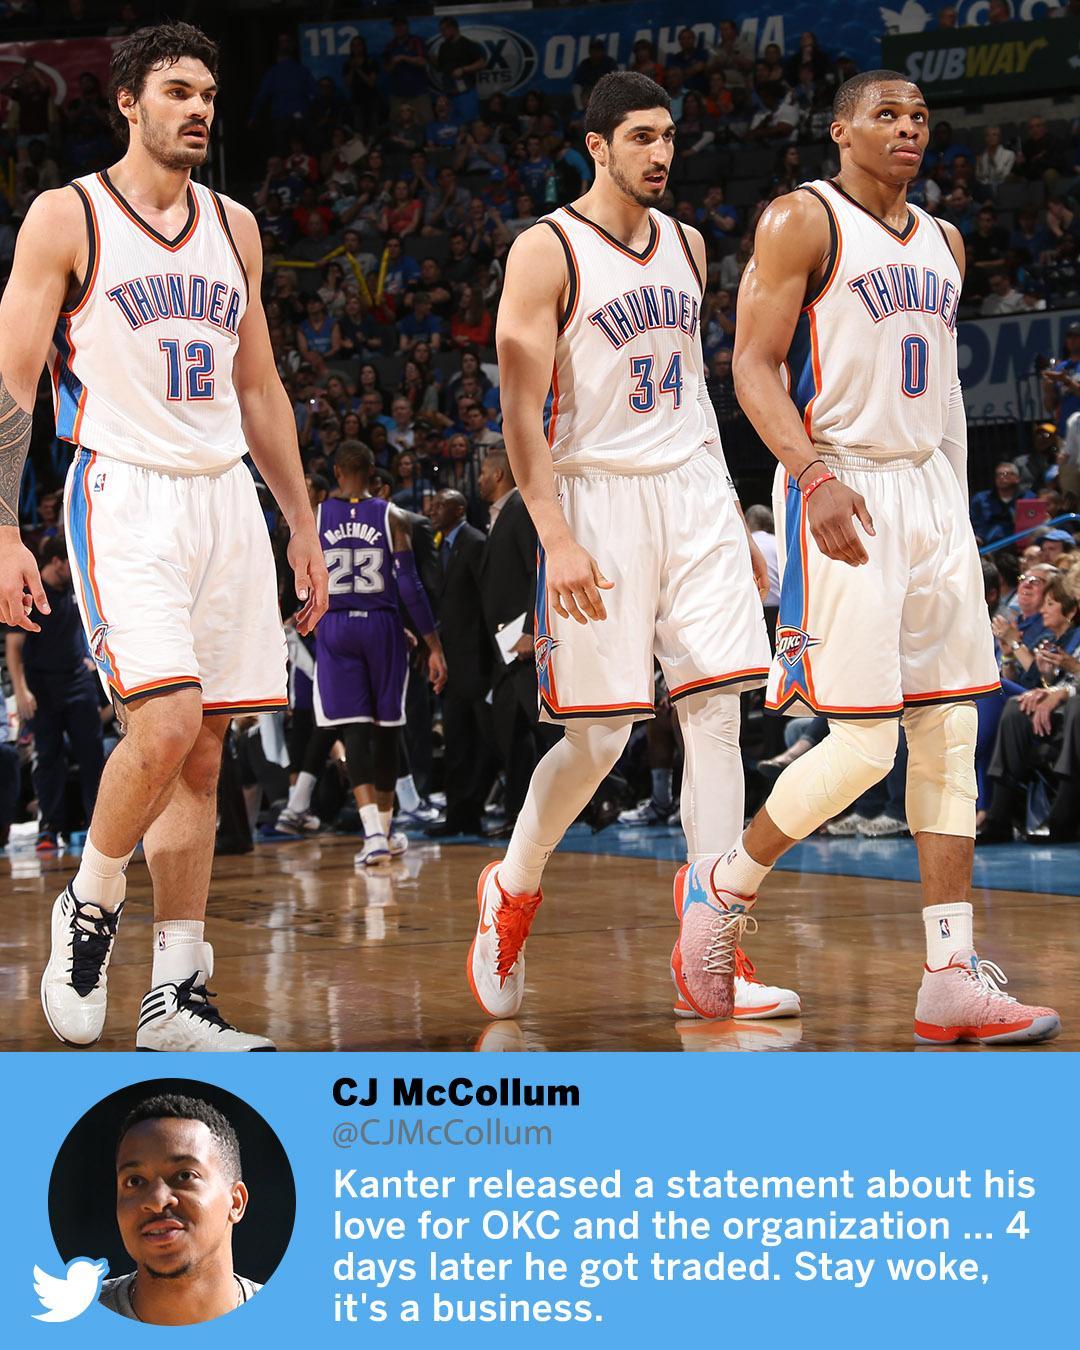 C.J. McCollum isn't here for your NBA loyalty talk. https://t.co/QPDKEBKu3h